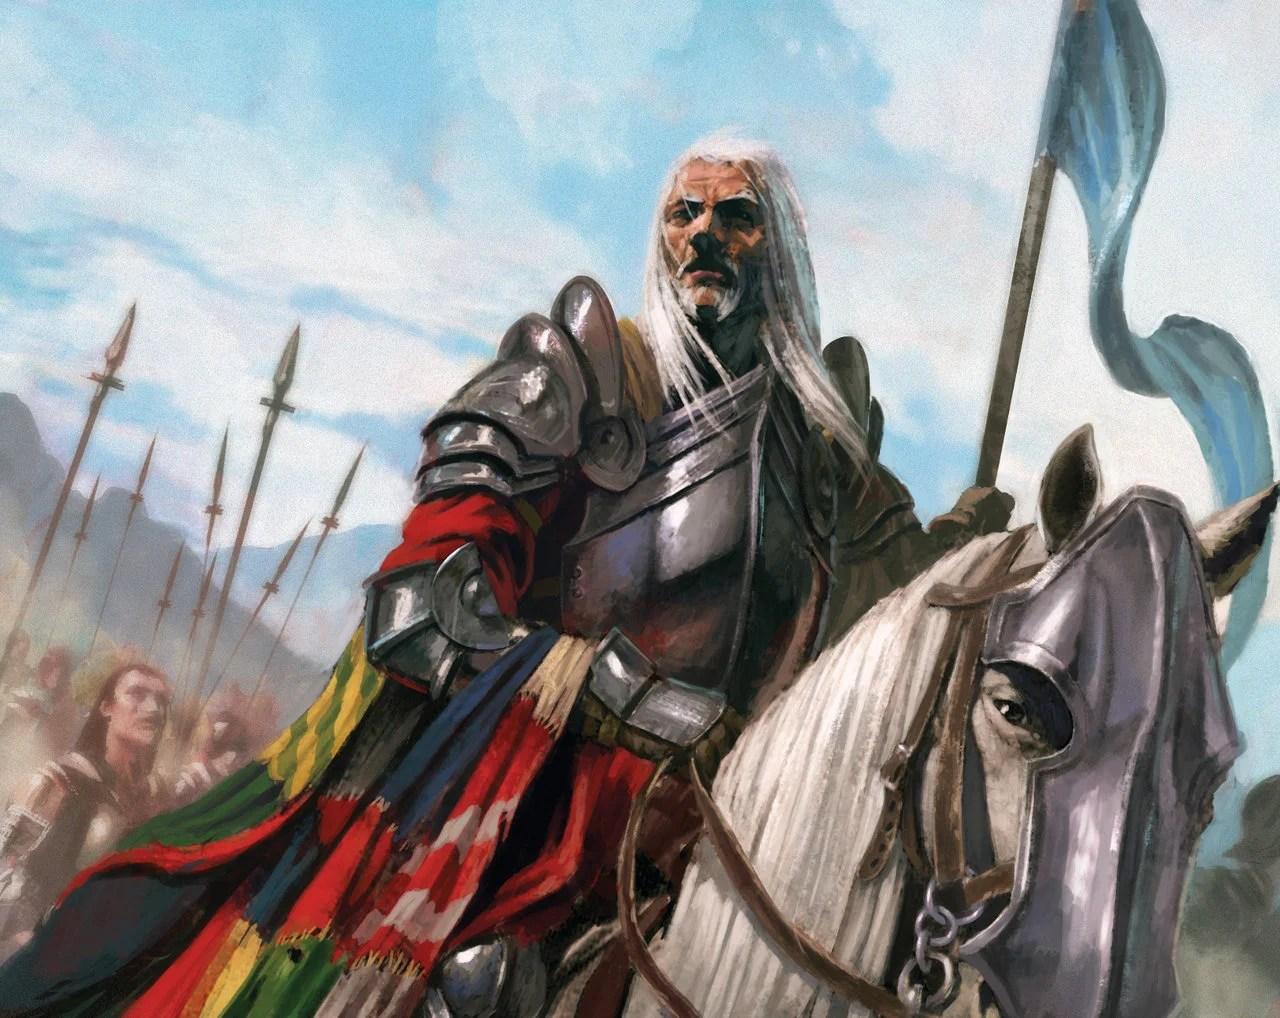 https://i0.wp.com/awoiaf.westeros.org/images/2/27/DiegoGisbertLlorens_tattered_princeII.jpg